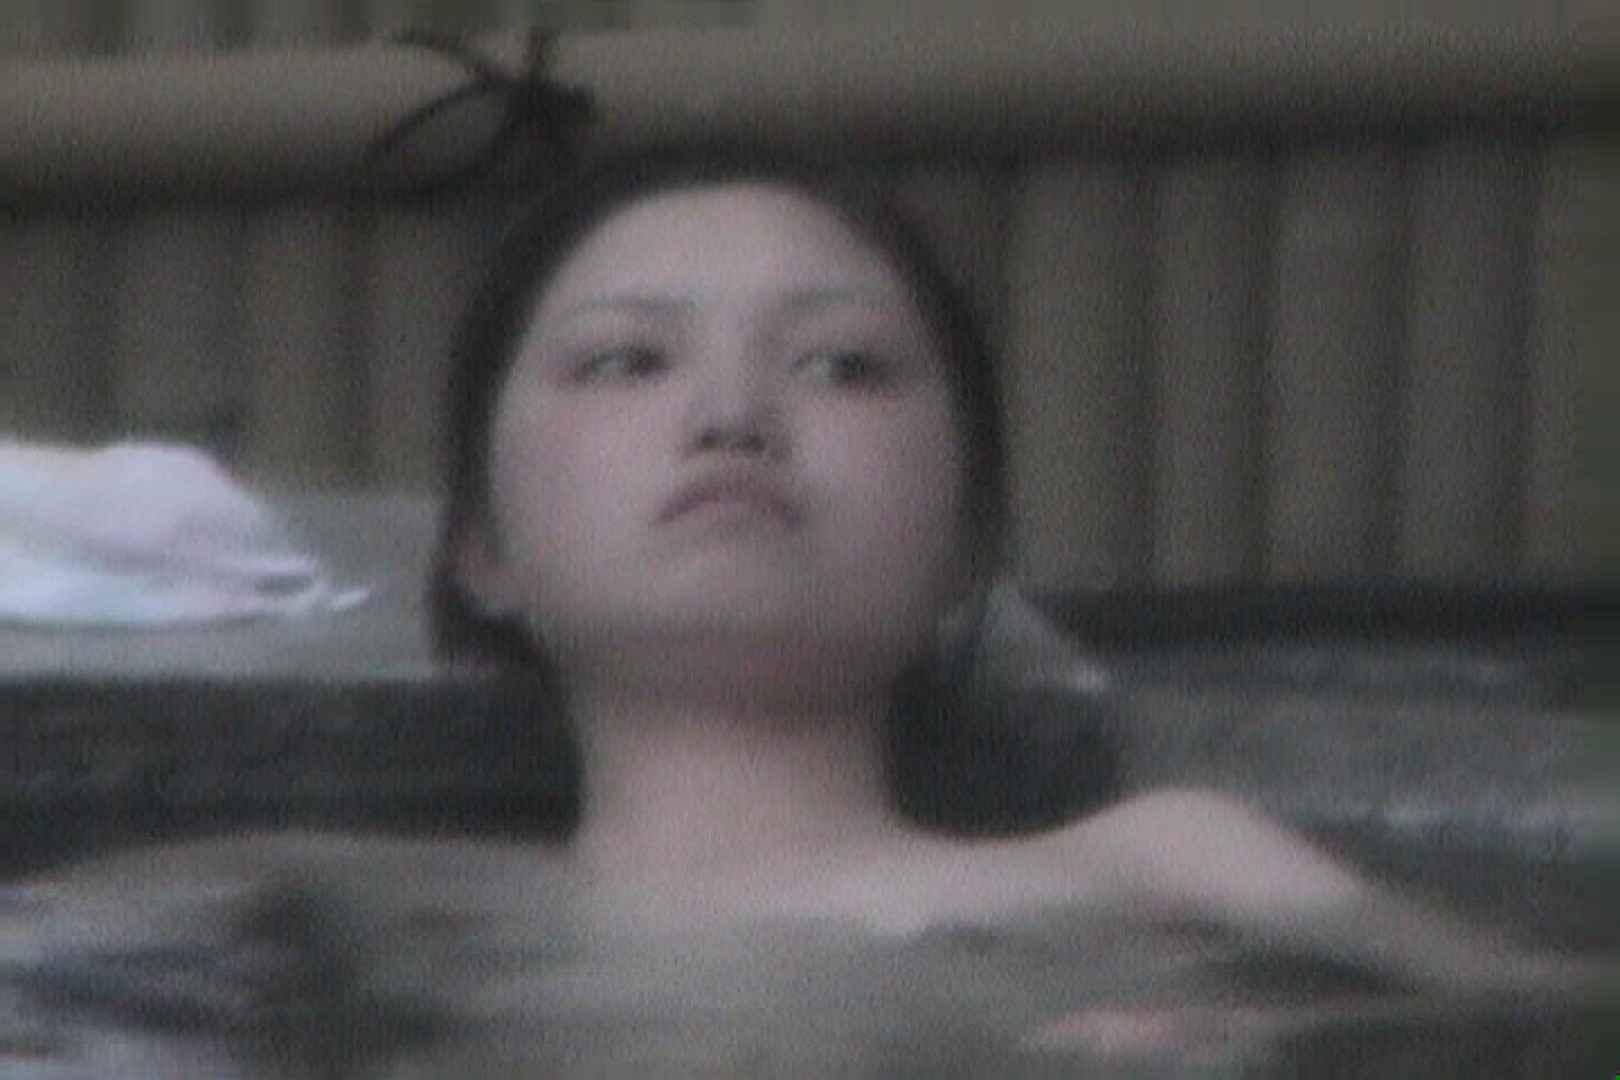 Aquaな露天風呂Vol.602 盗撮師作品  98pic 12